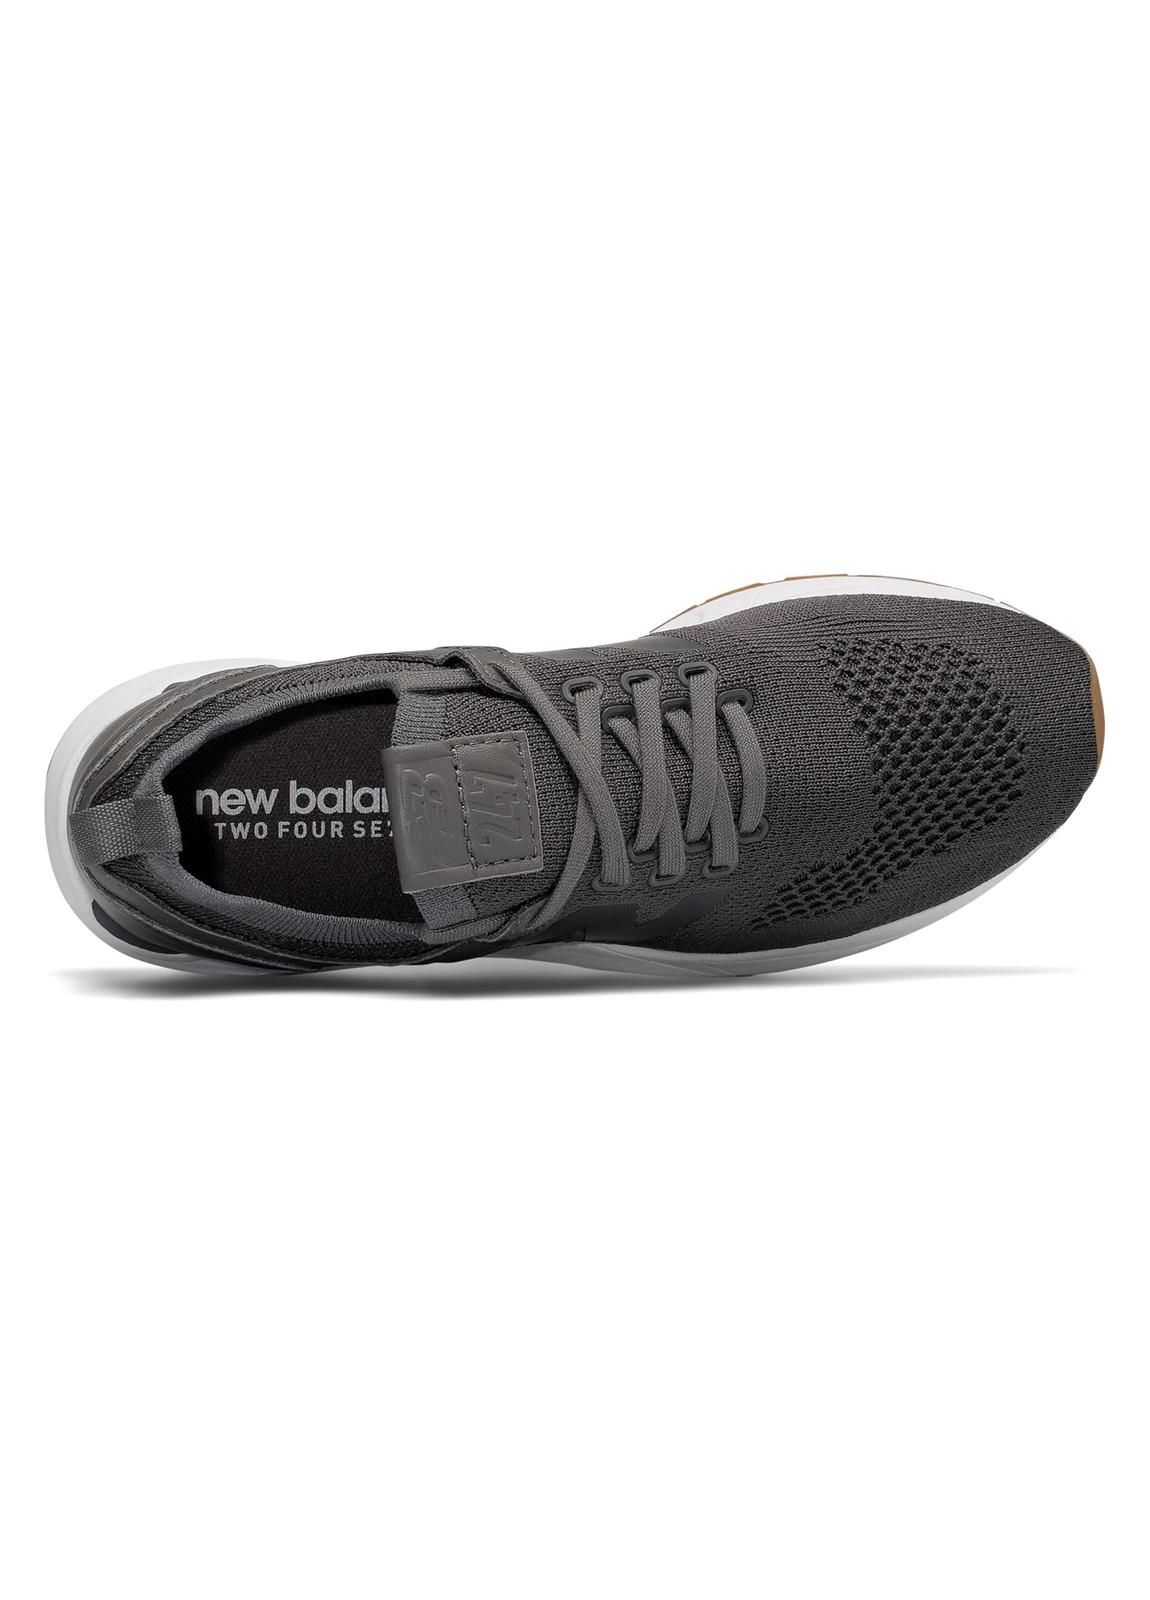 Sneaker woman MRL247 color gris oscuro, piel y malla. - Ítem1